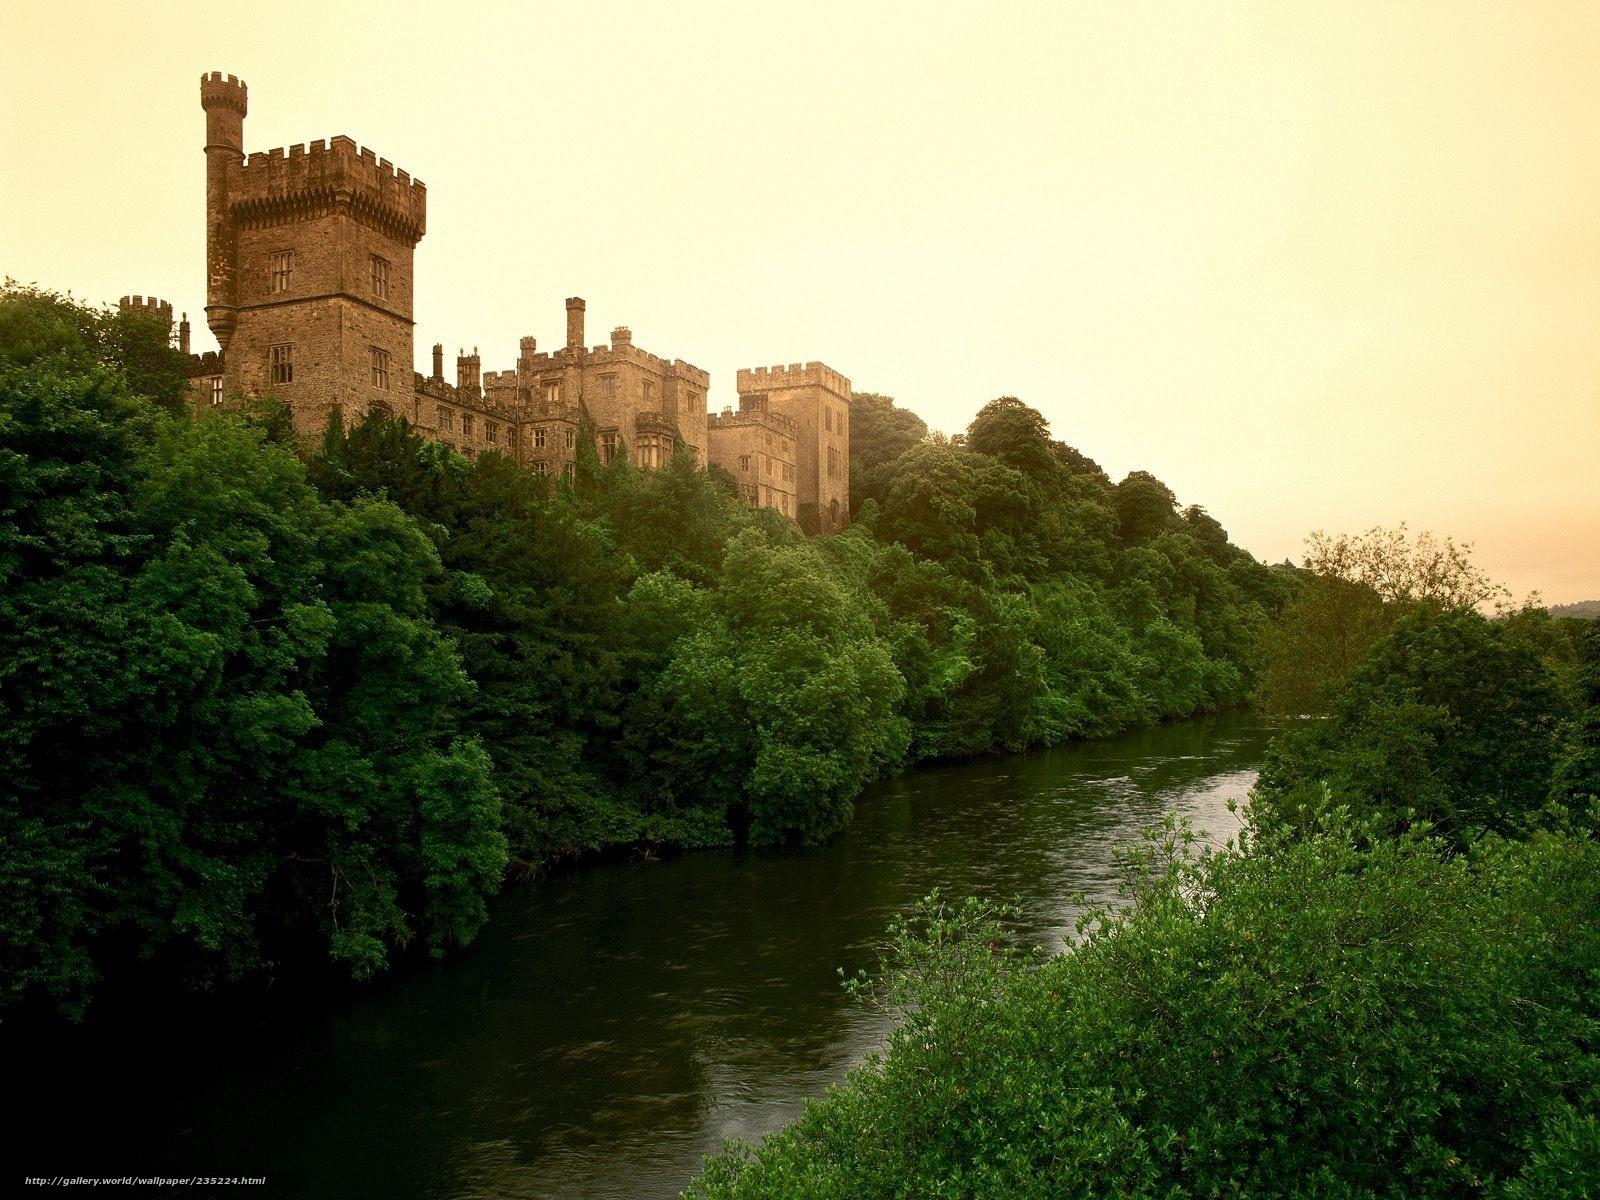 река, англия, замок